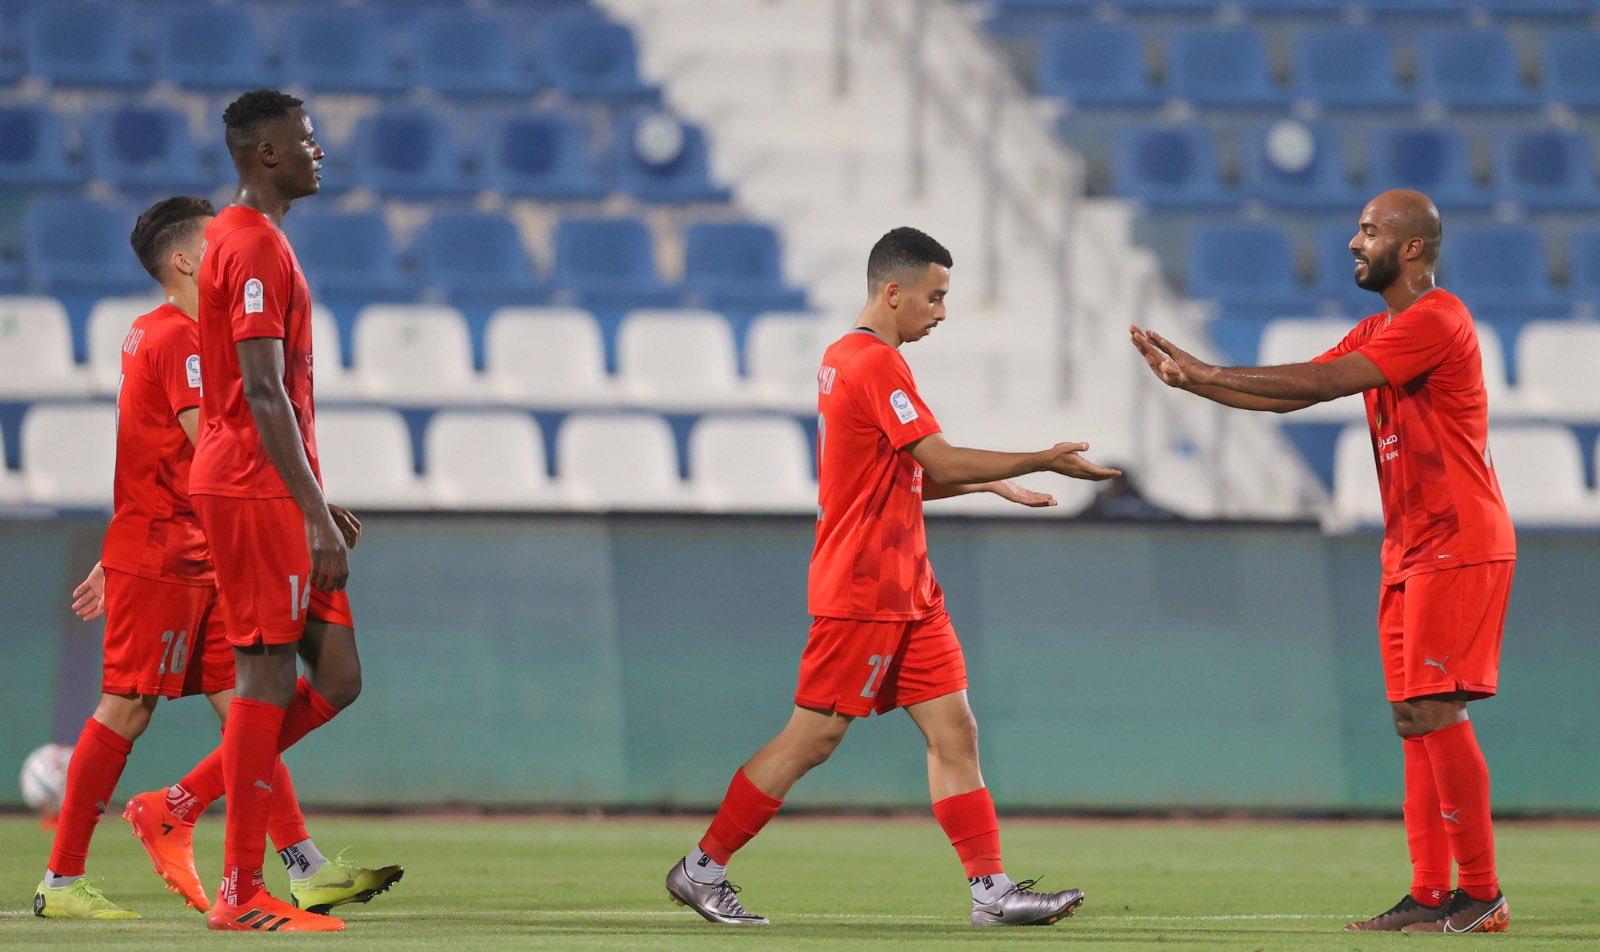 QNB Stars League: Duhail 4-1 Al Khor